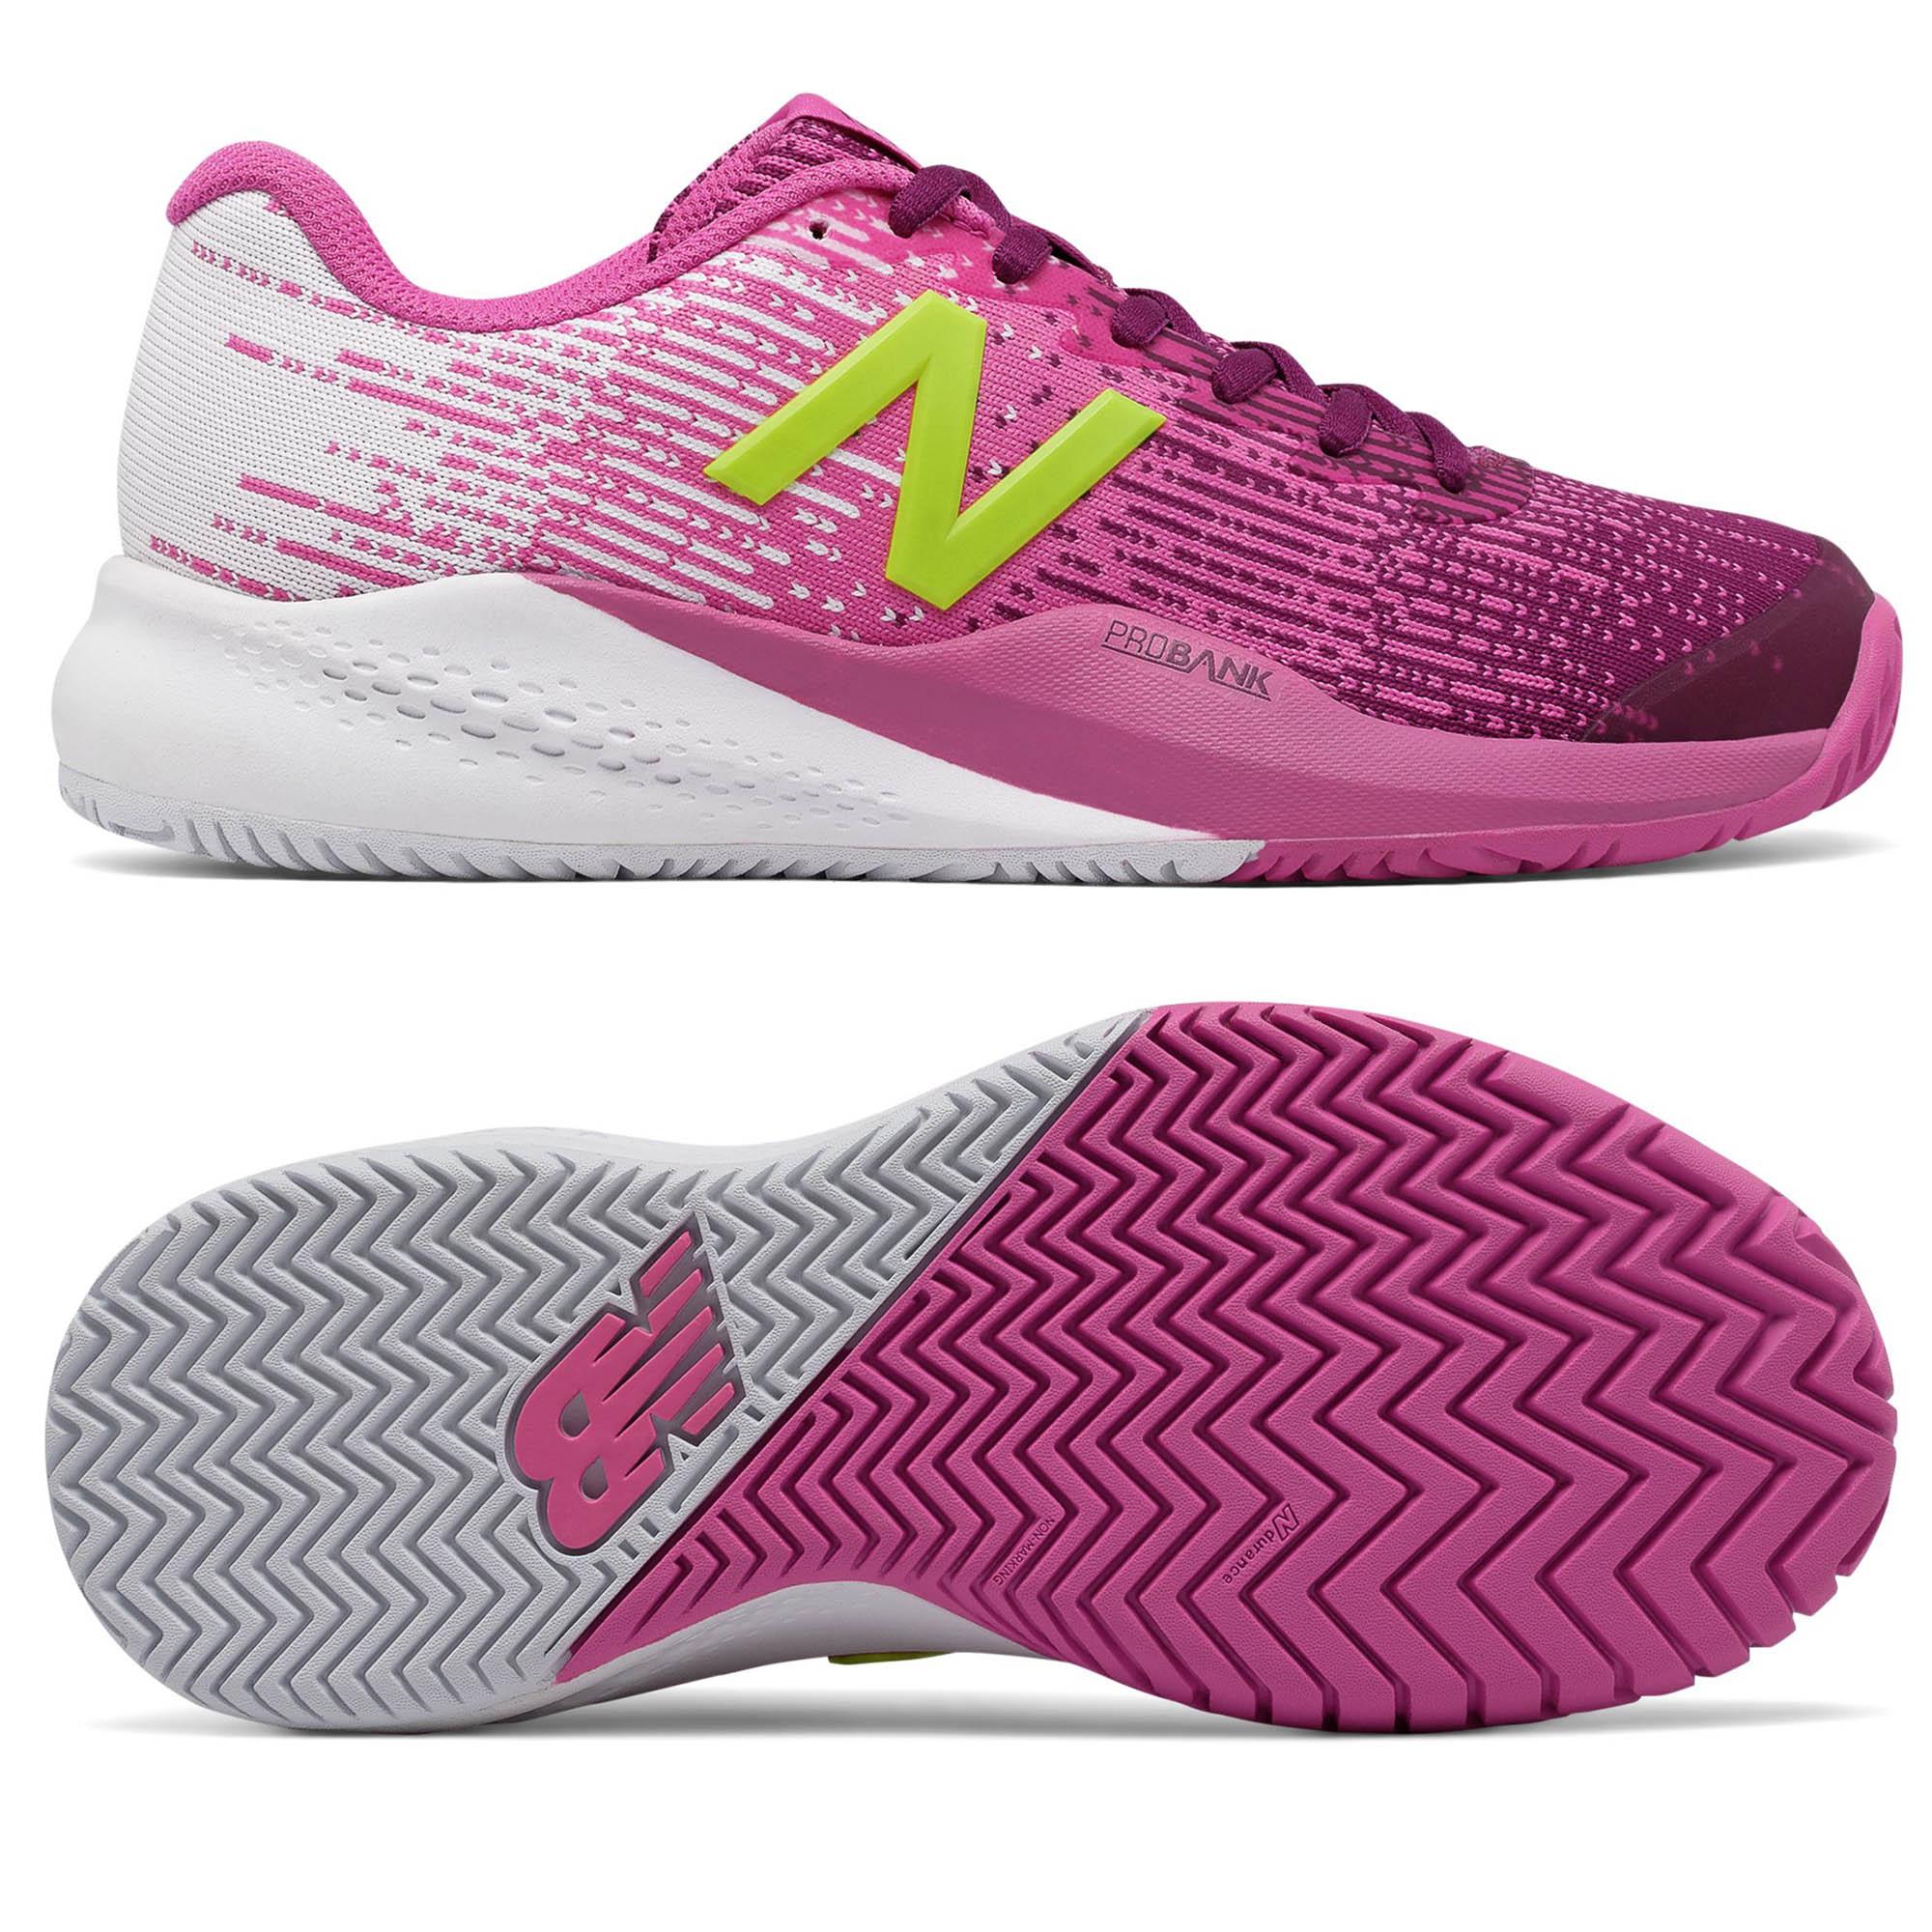 Image of New Balance WC996 v3 Ladies Tennis Shoes - Pink/White, 7 UK